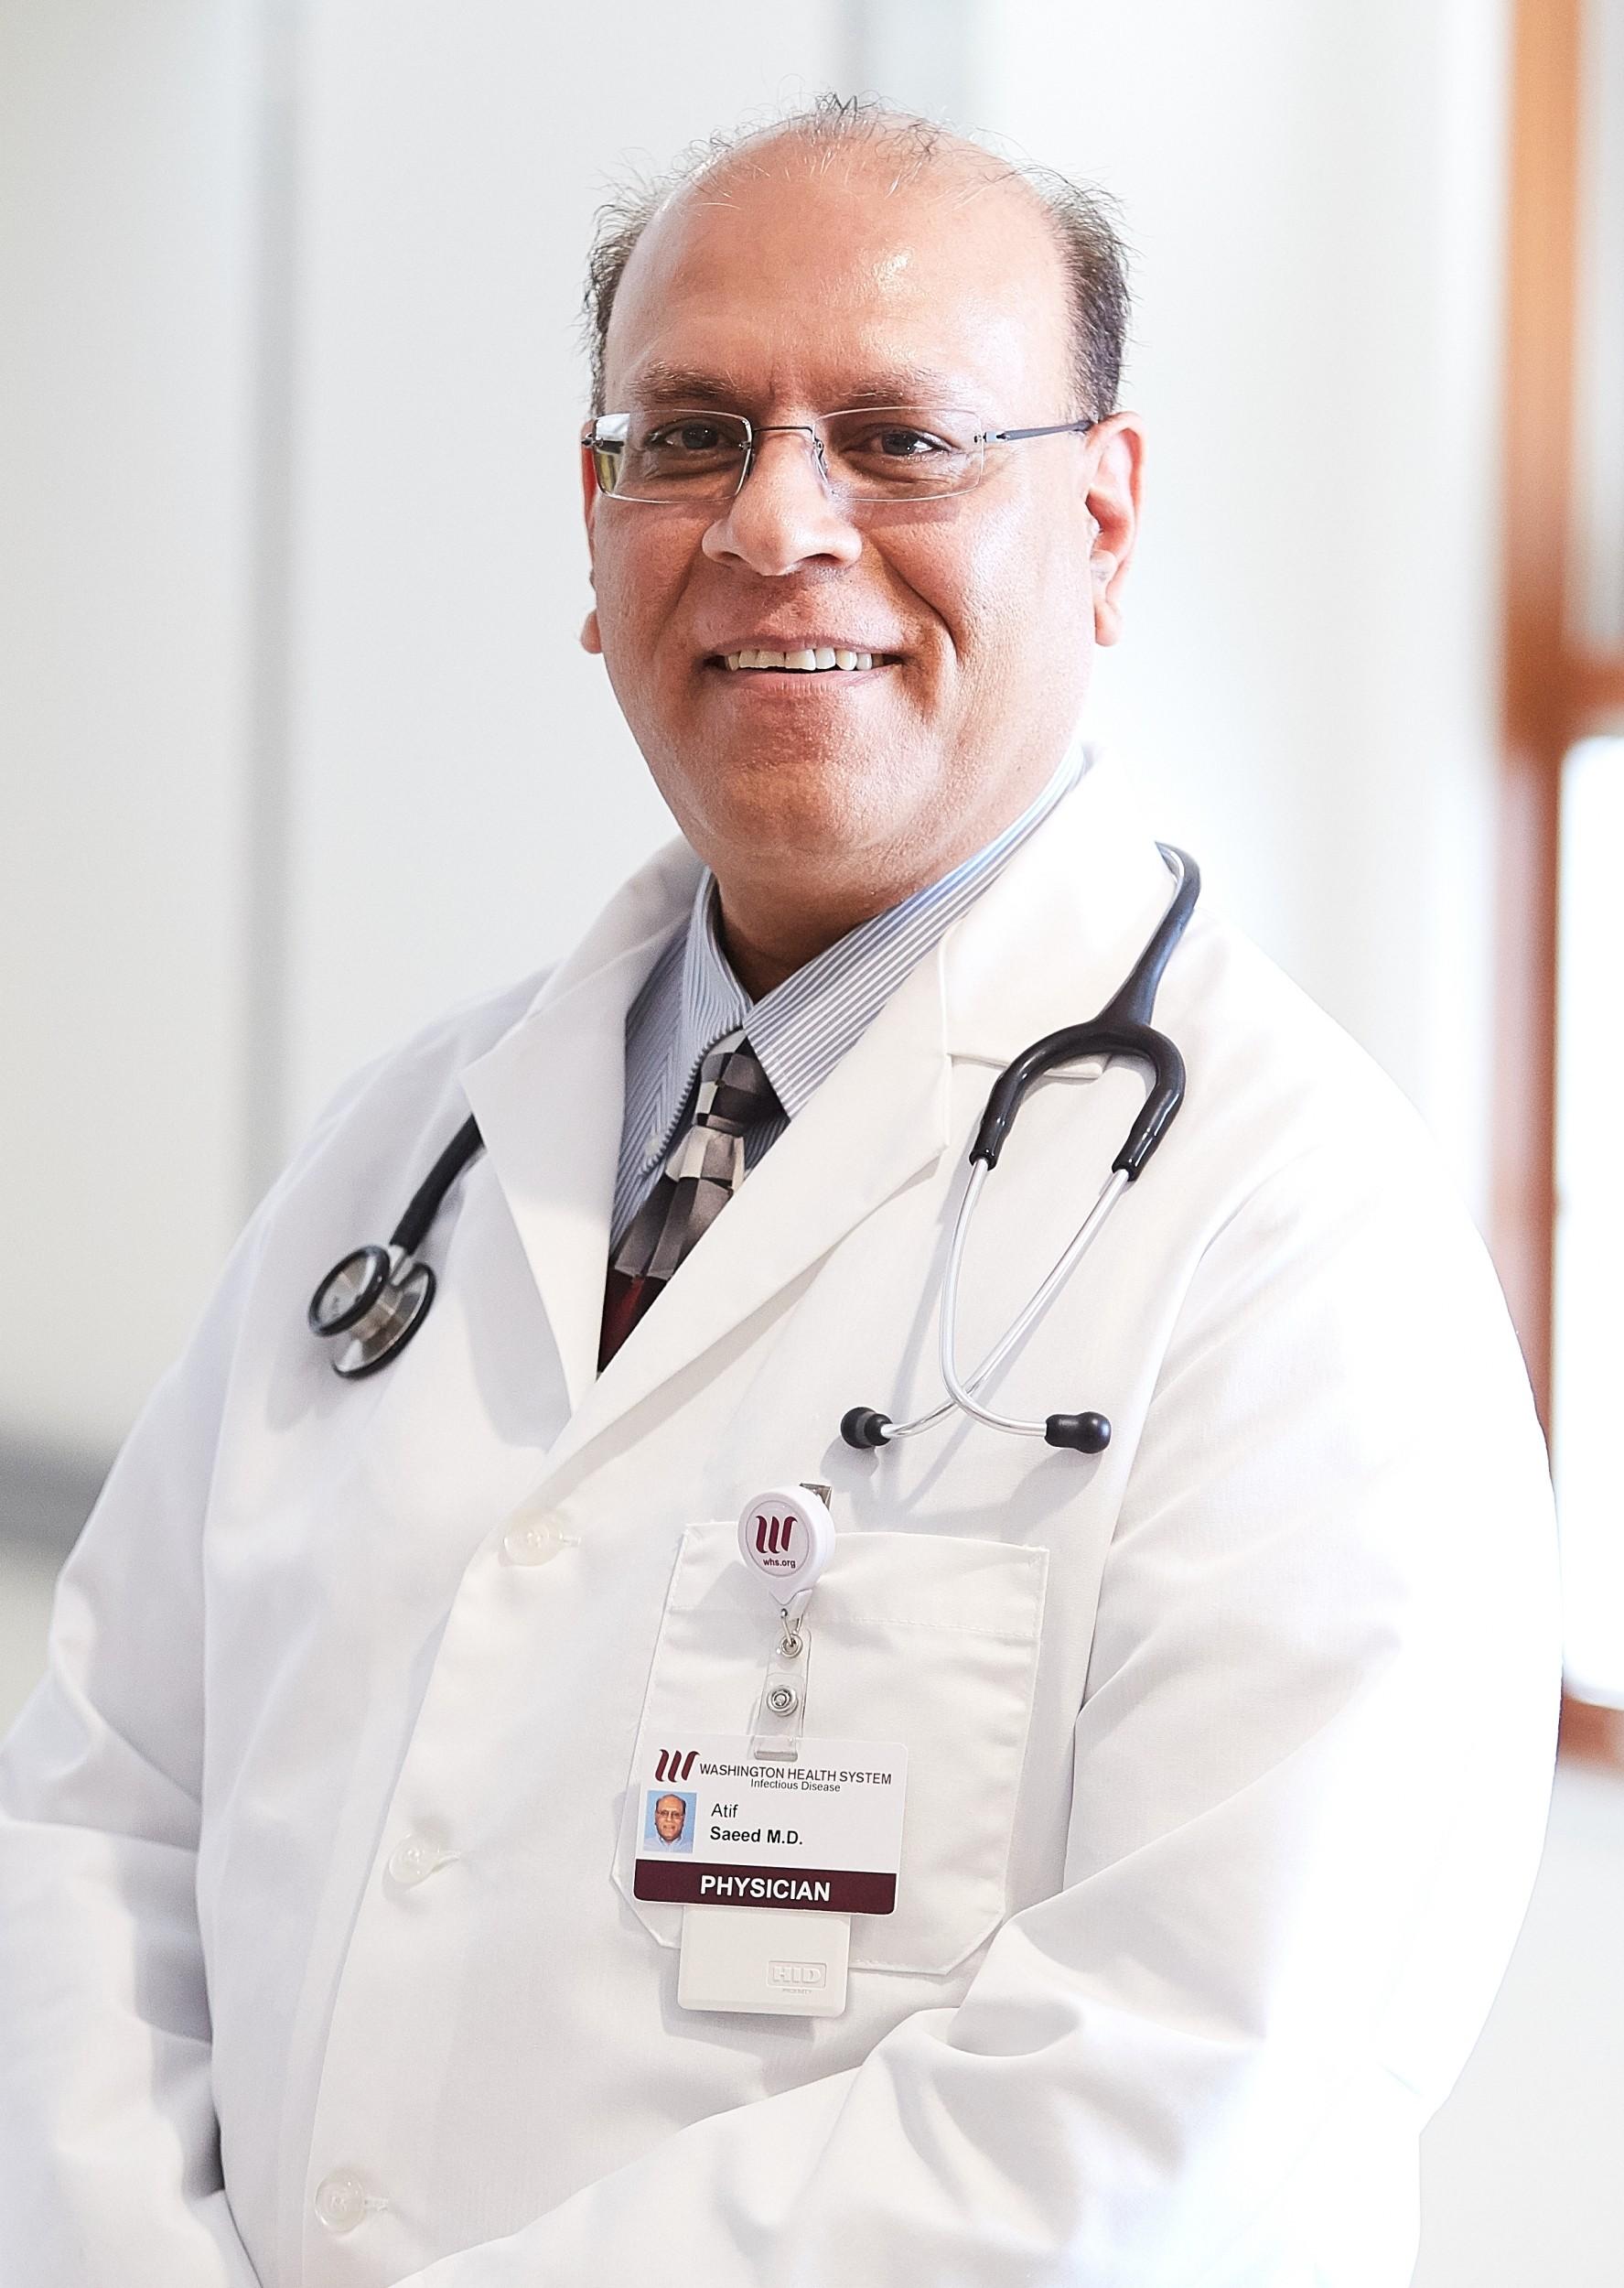 Dr. Saeed